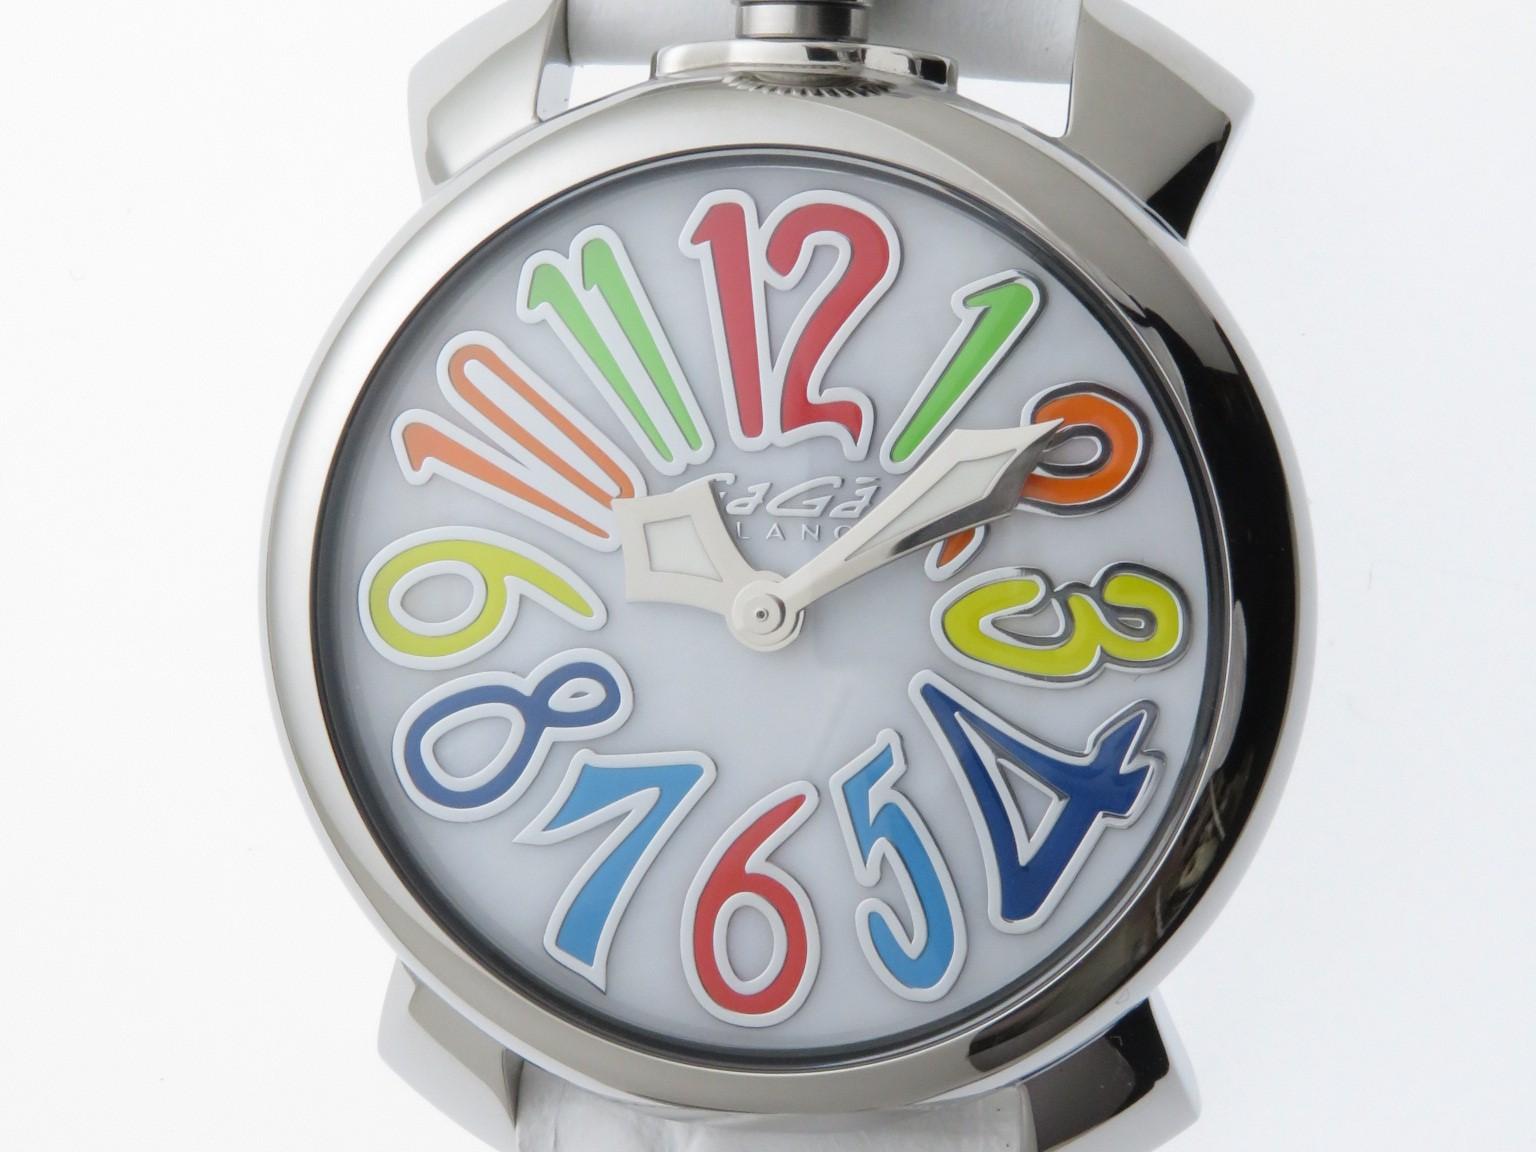 GaGa MILANO 時計 ガガミラノ マヌアーレ 5020 クオーツ マルチカラーインデックス SS/革 男性用時計 2143000528407【430】